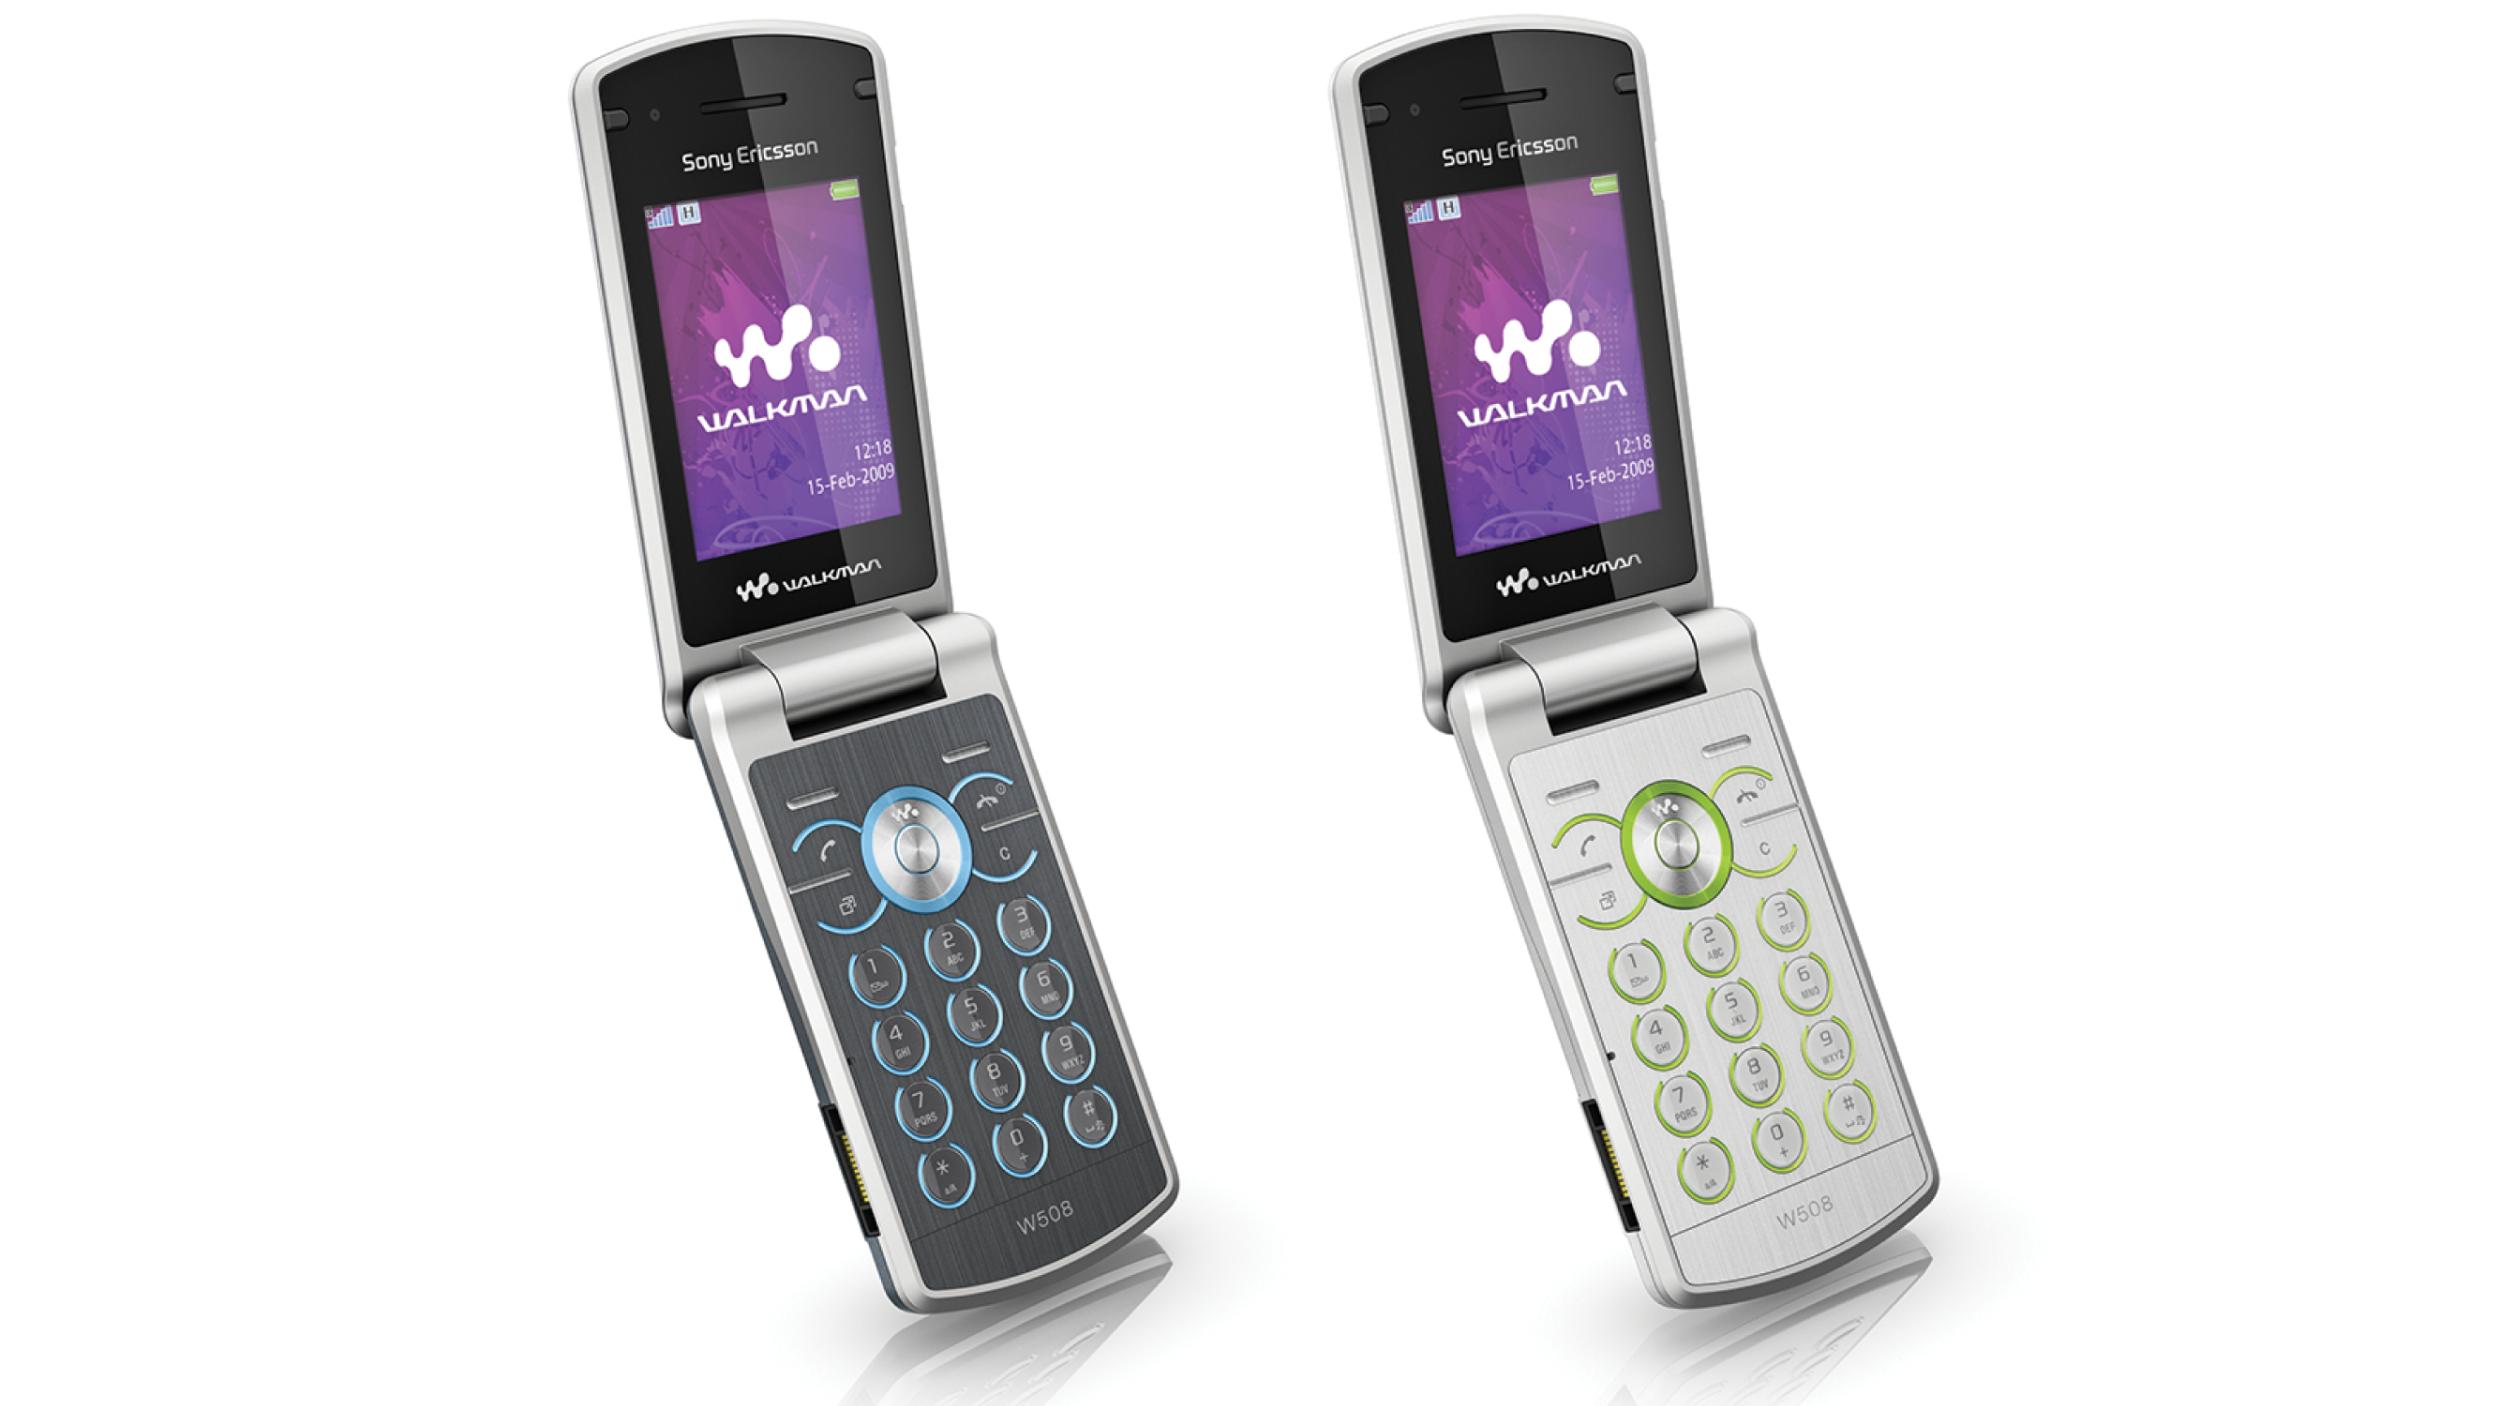 sony-ericsson-walkman-phone